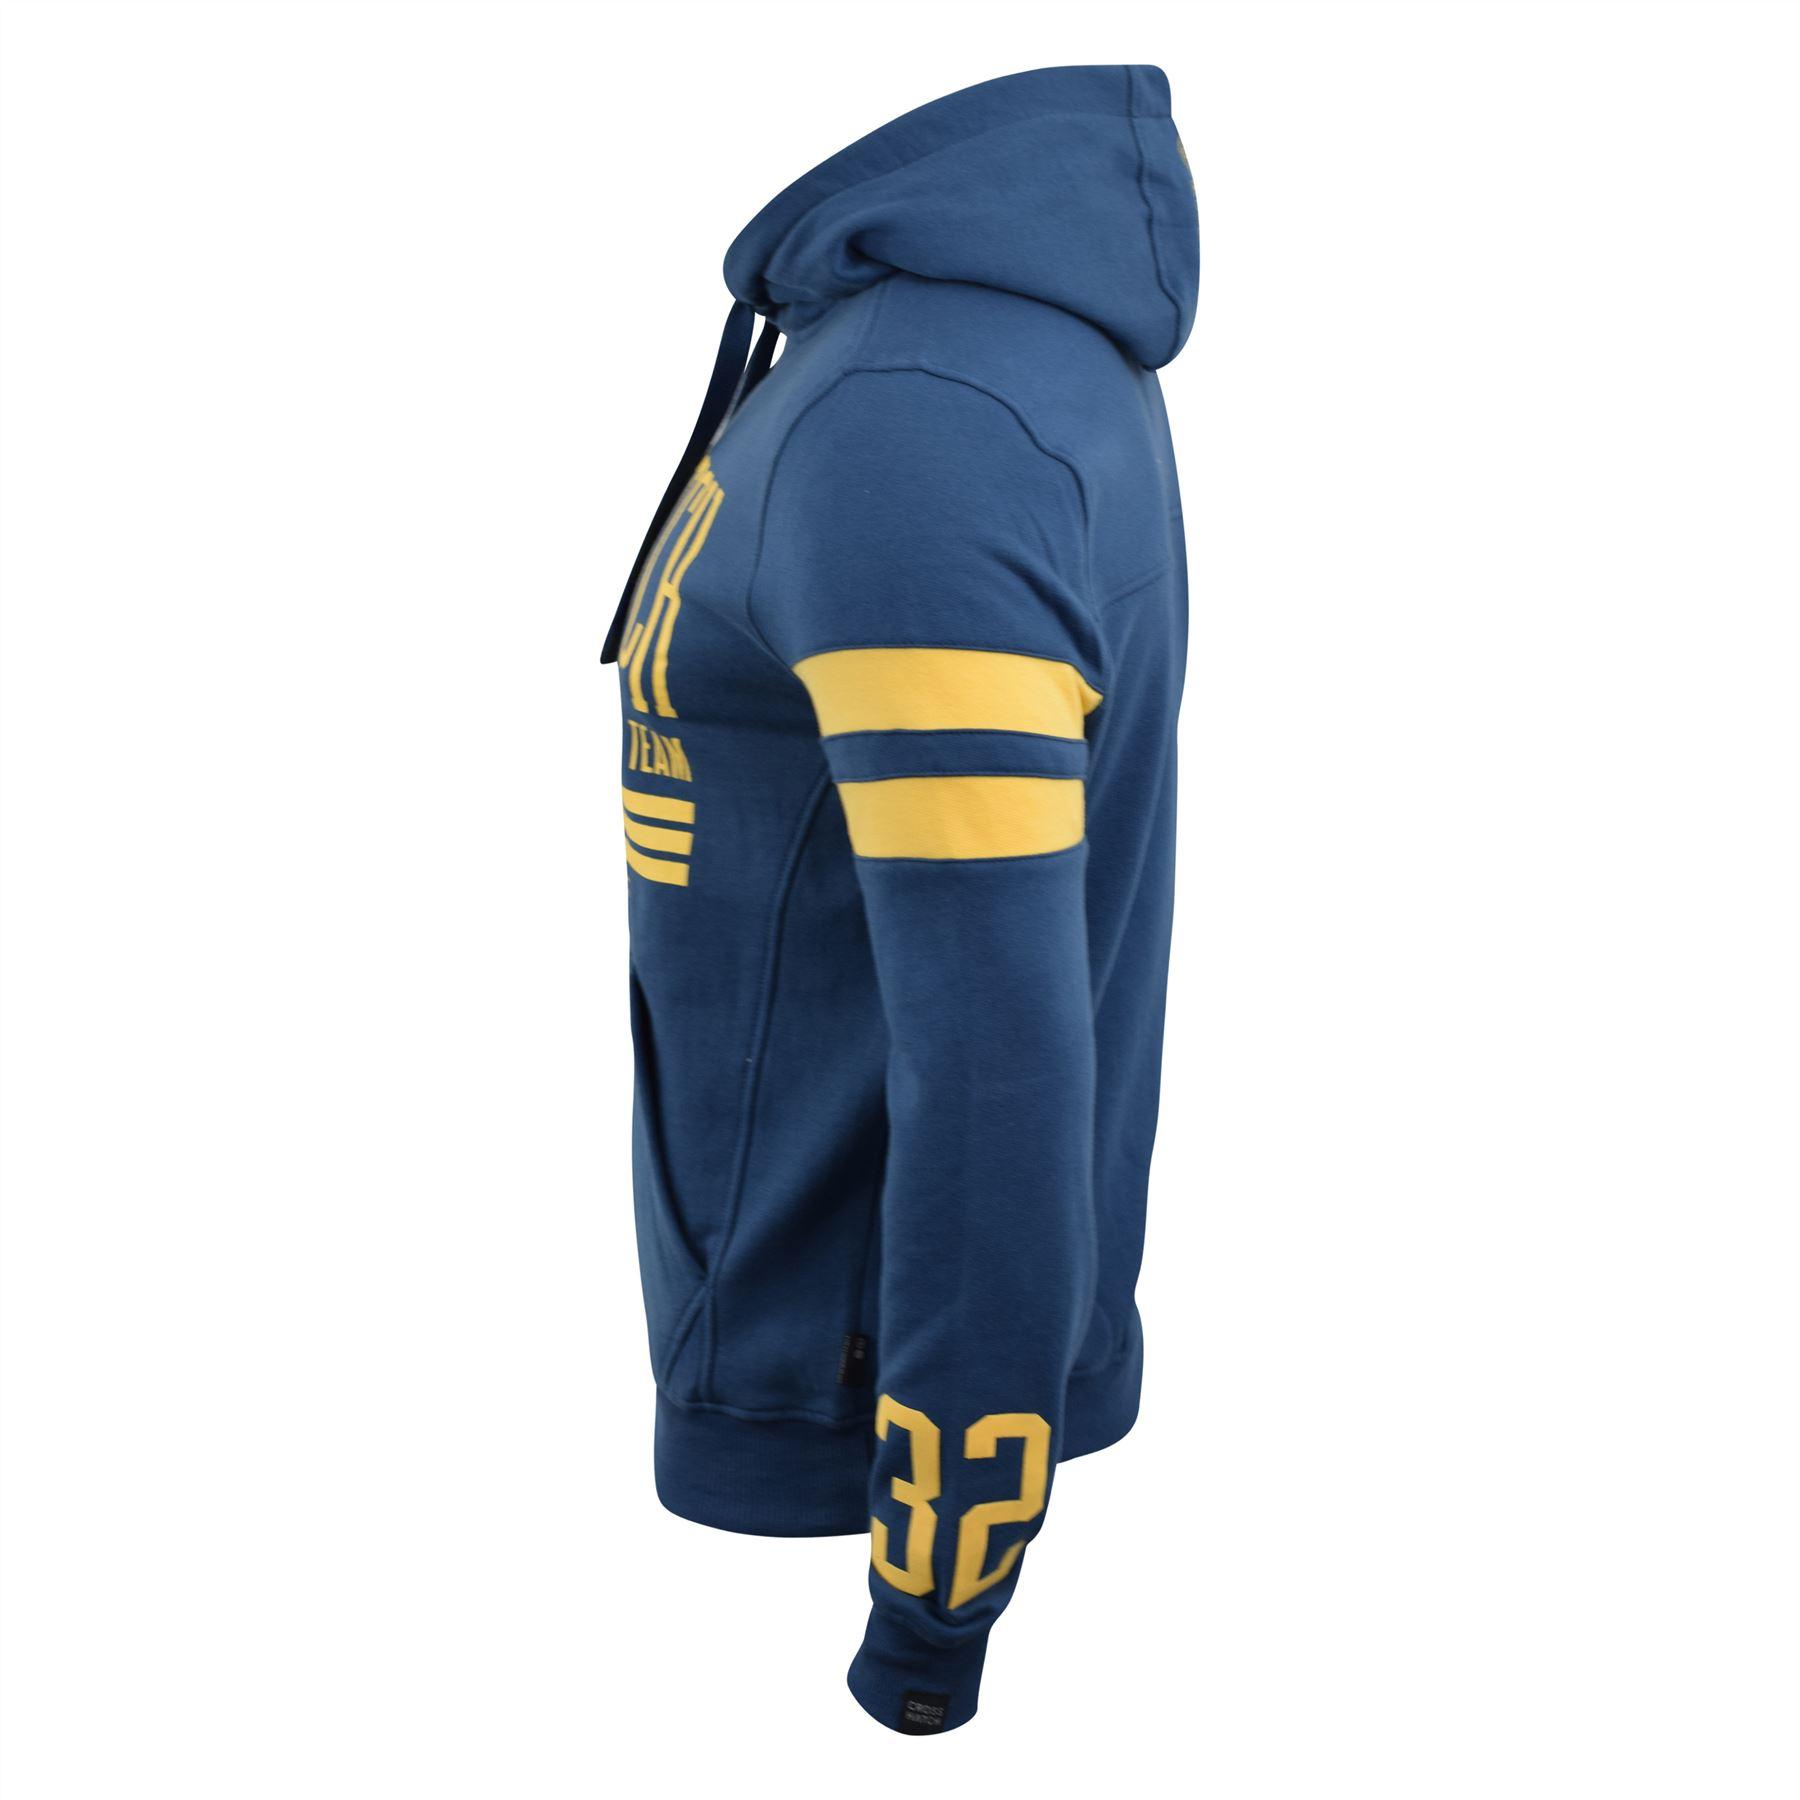 Mens-Hoodie-Crosshatch-Clothing-Sweatshirt-Hooded-Jumper-Top-Pullover-Cramform thumbnail 3